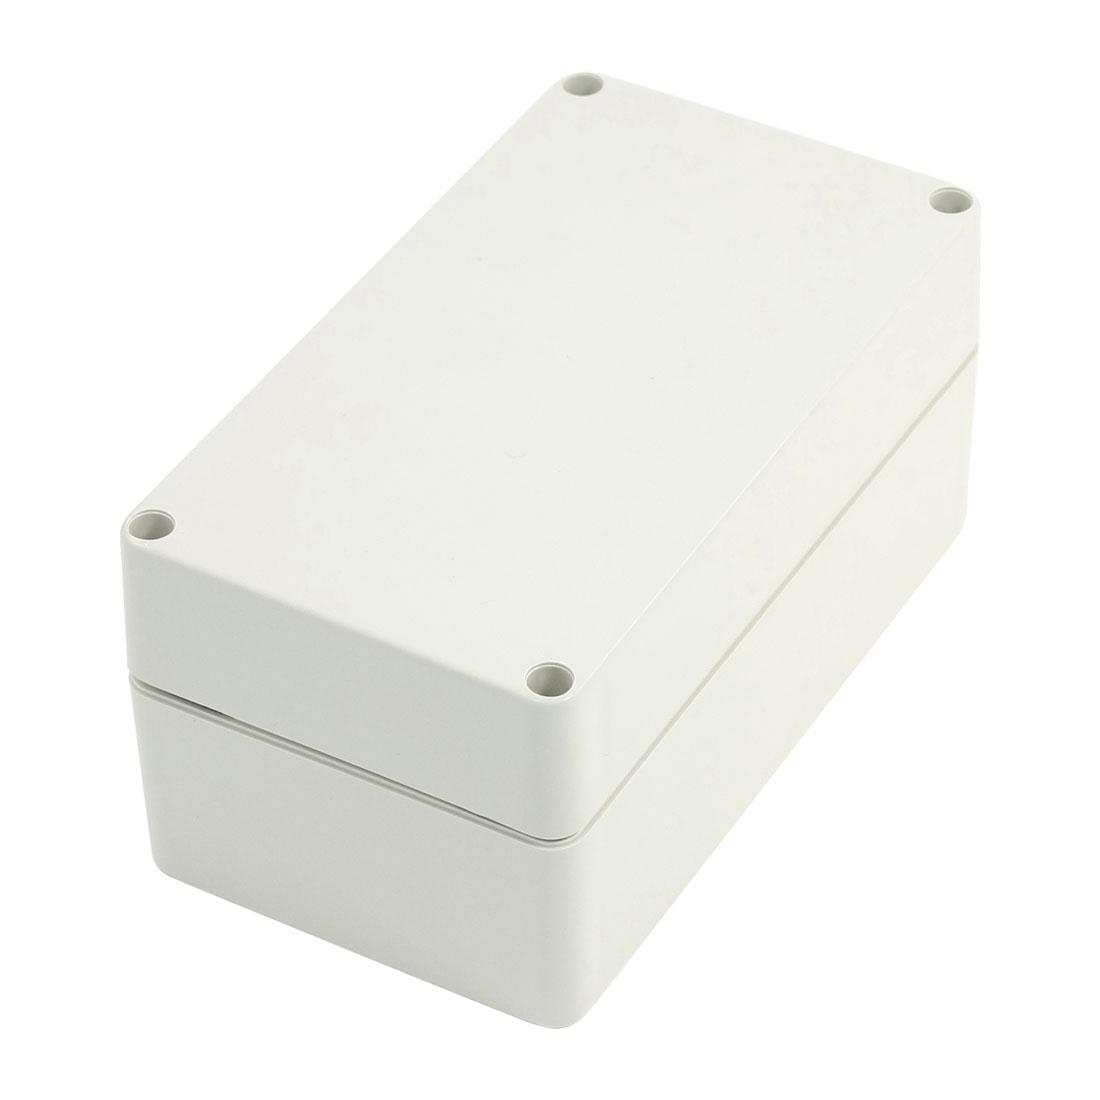 158mmx90mmx75mm Waterproof Plastic Enclosure Case Power Junction Box